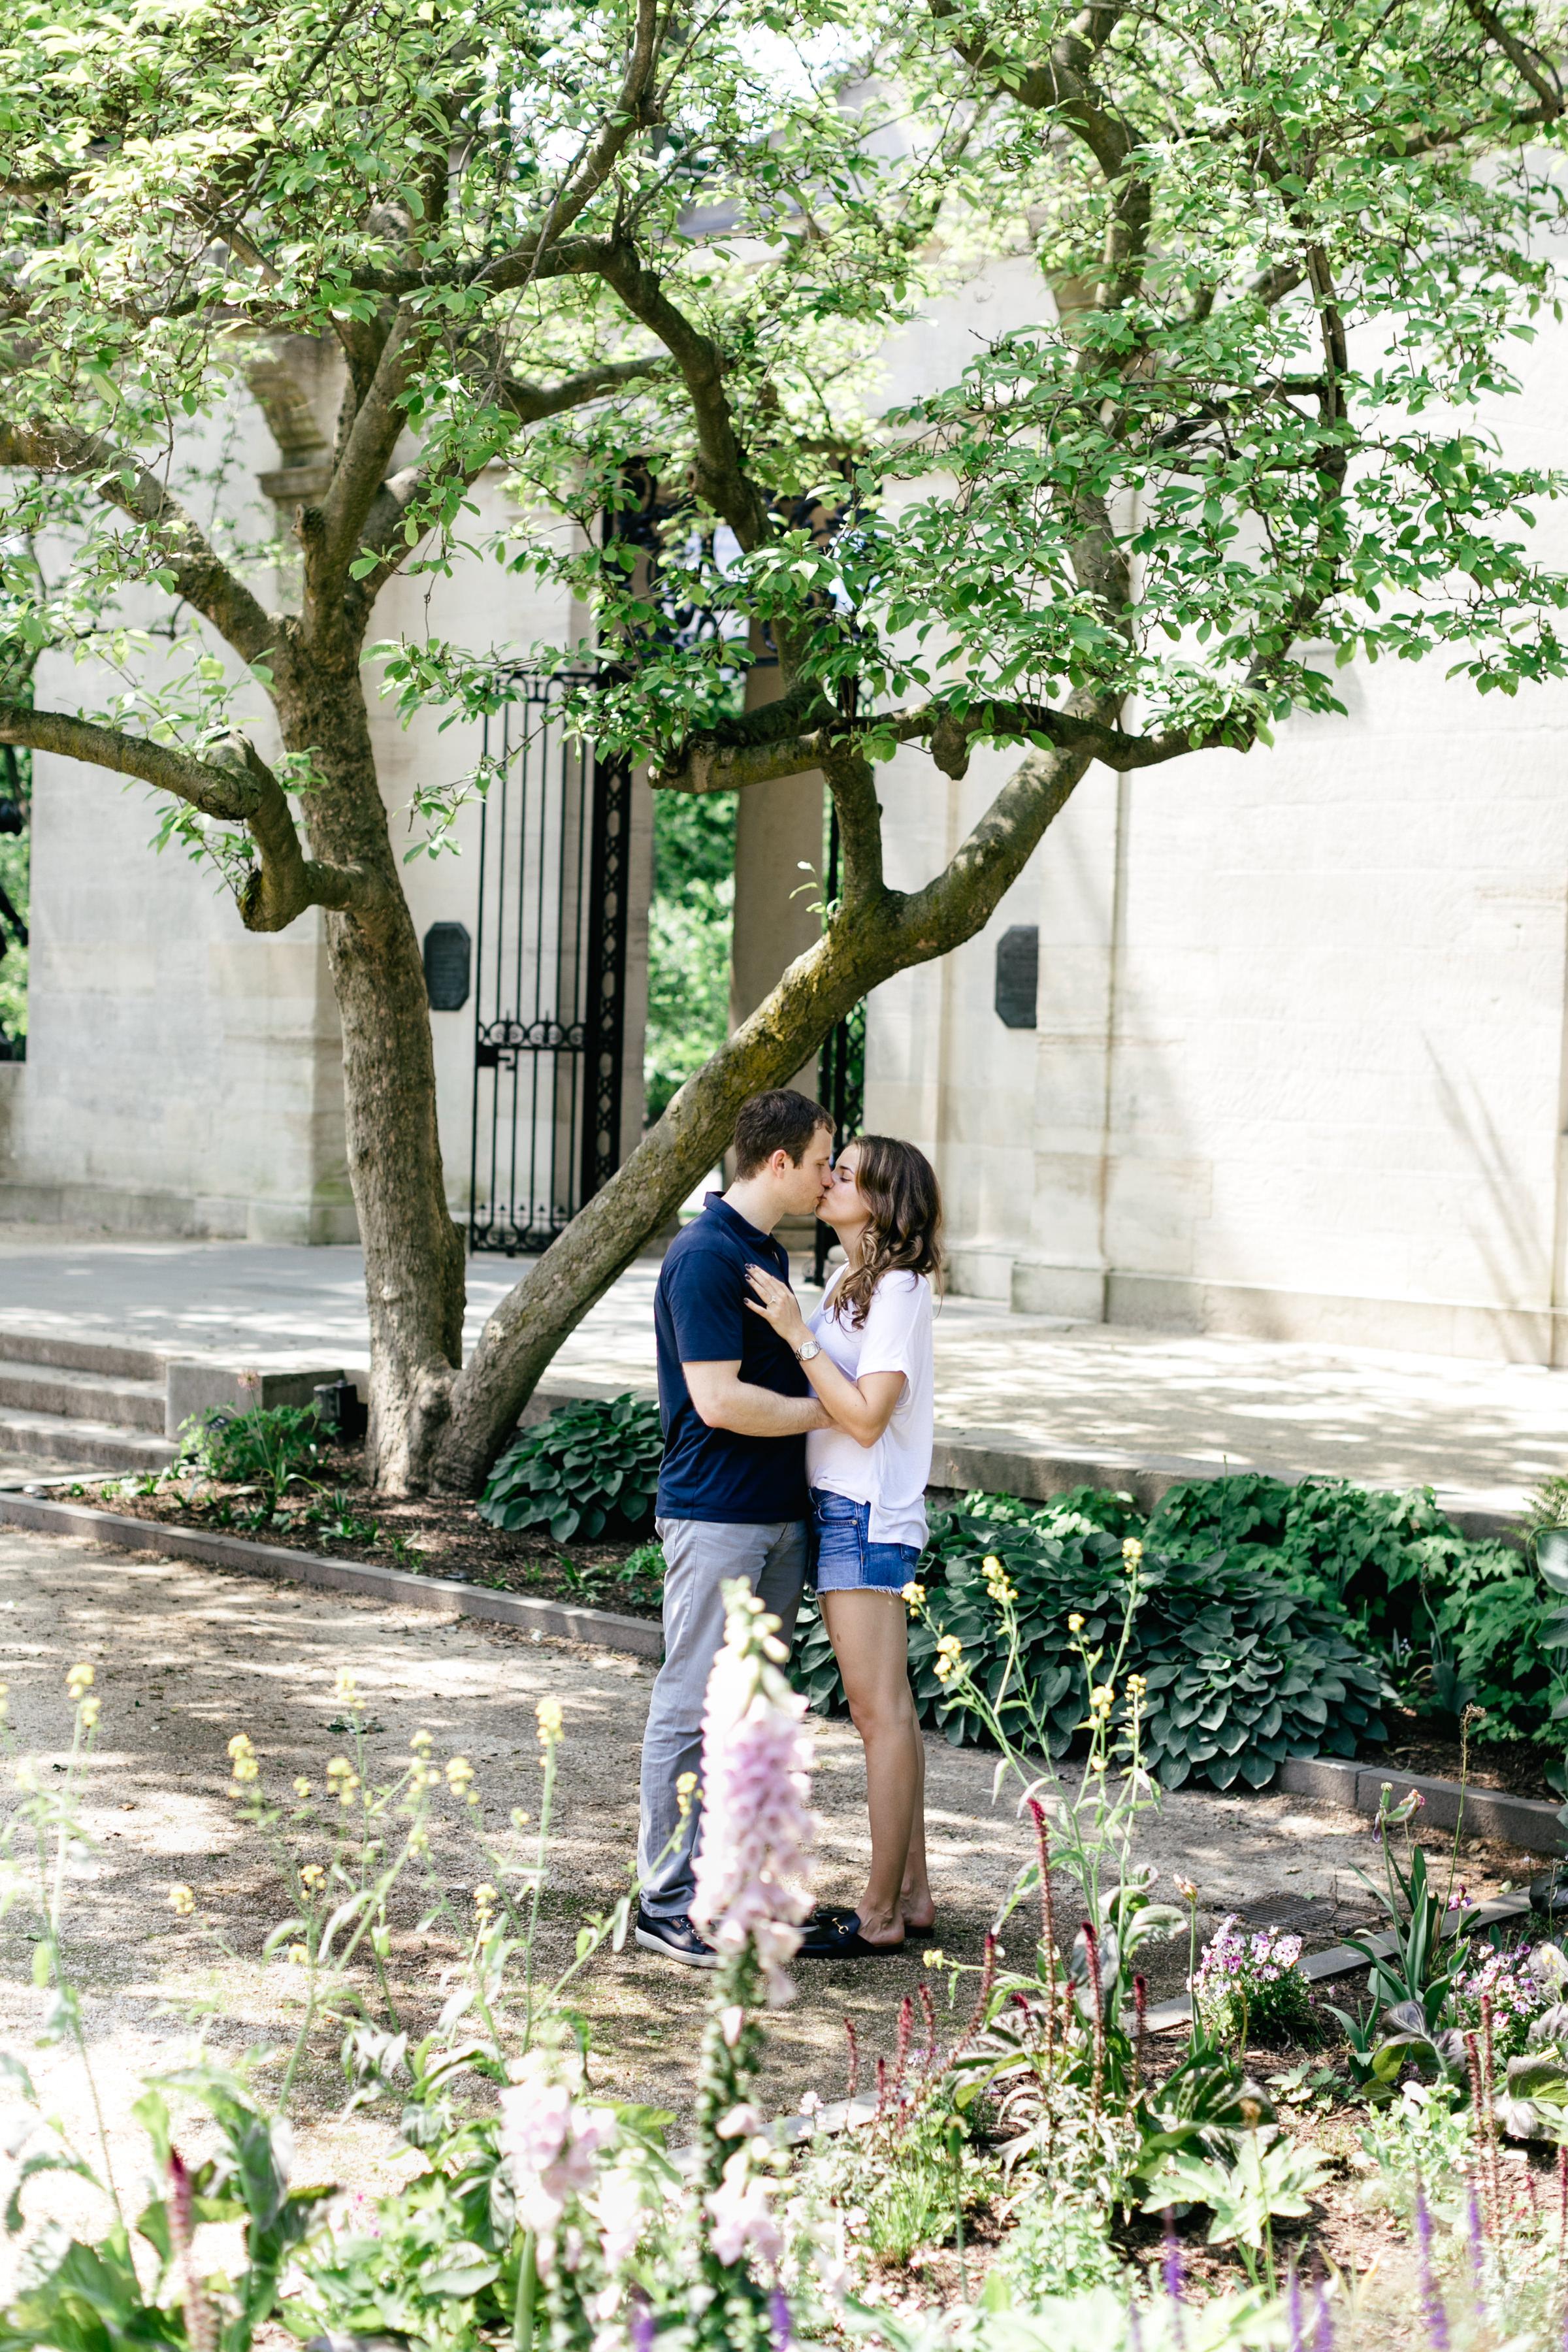 photography-natural-candid-engaged-proposal-philadelphia-wedding-rodin museum-barnes foundation-parkway-modern-lifestyle-08.JPG